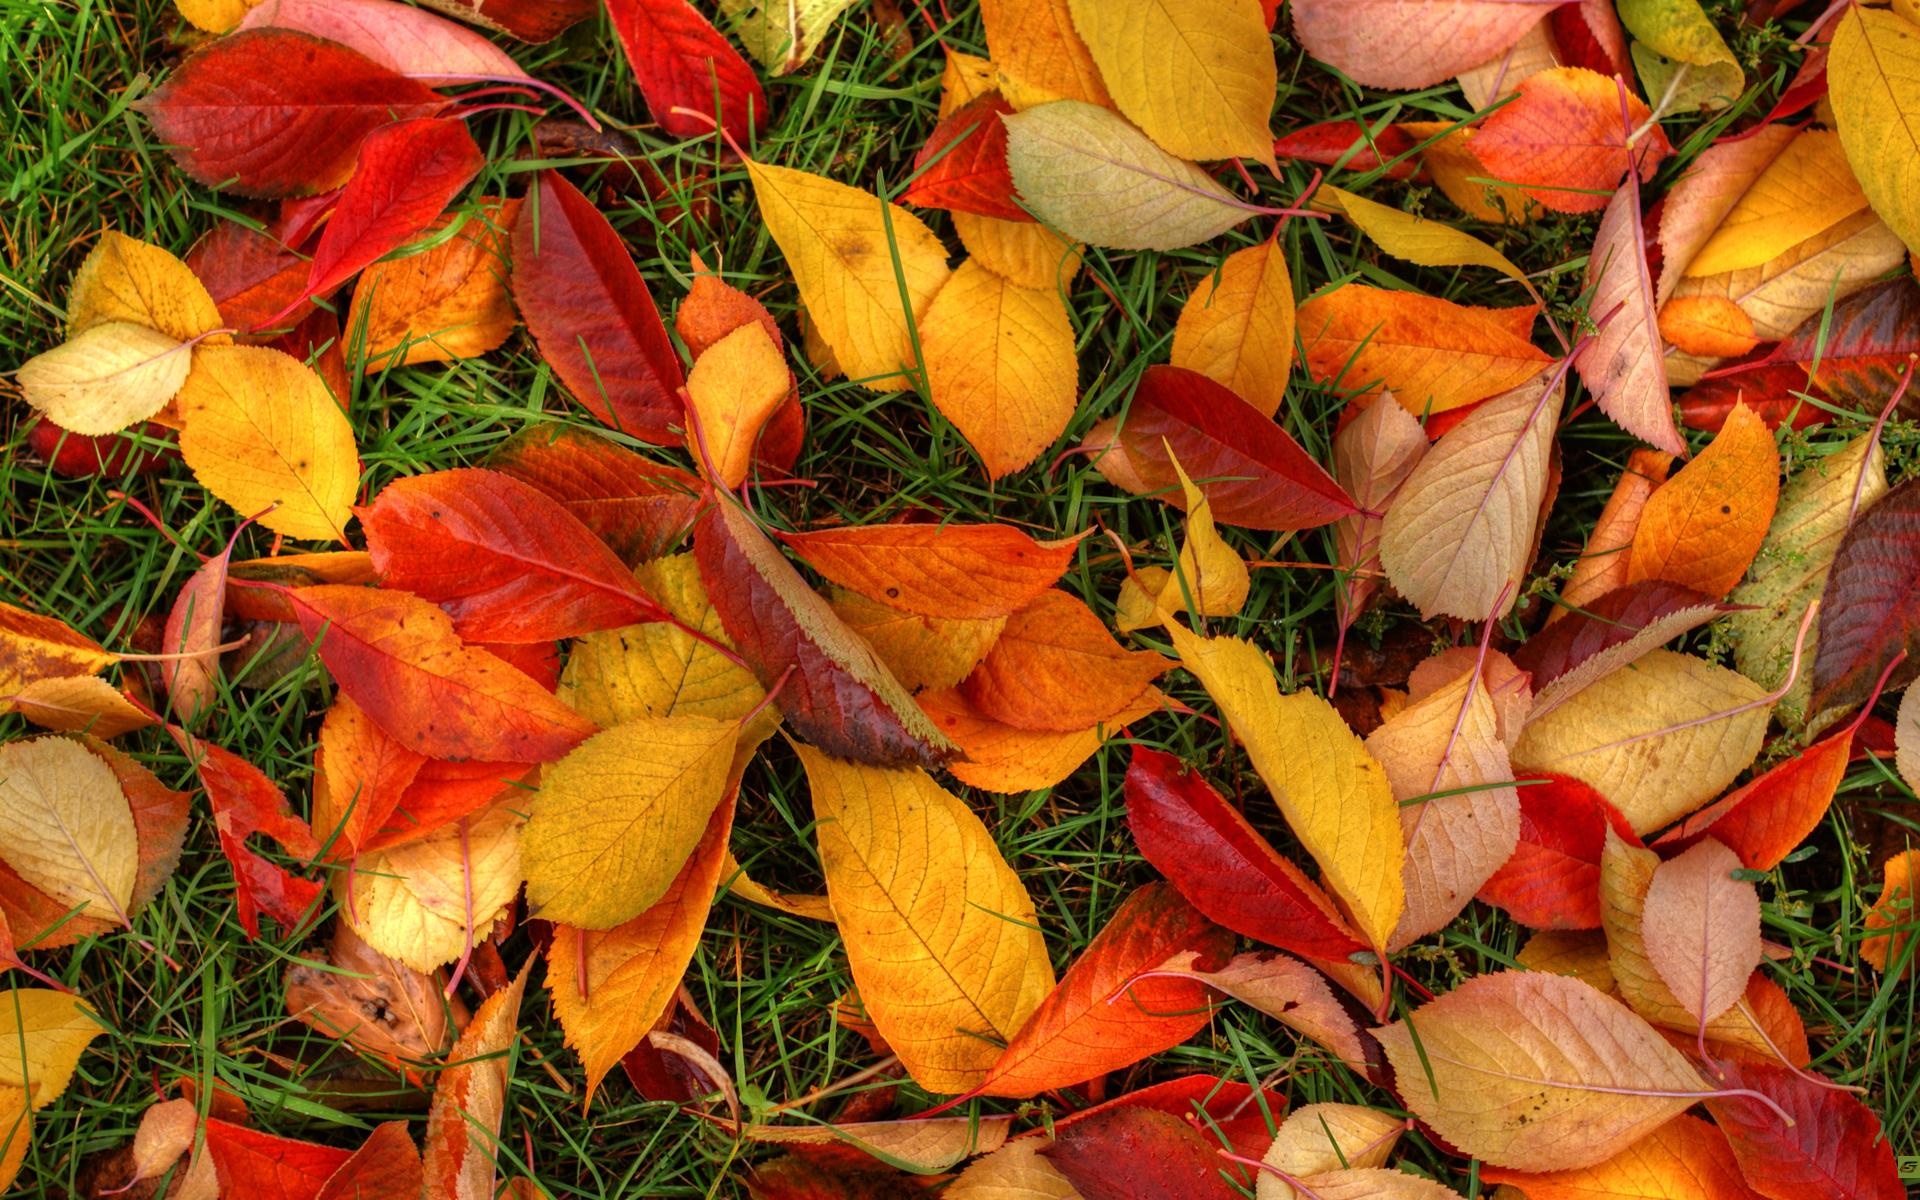 Autumn Leaves Wallpaper Hd Autumn leaves 1920x1200